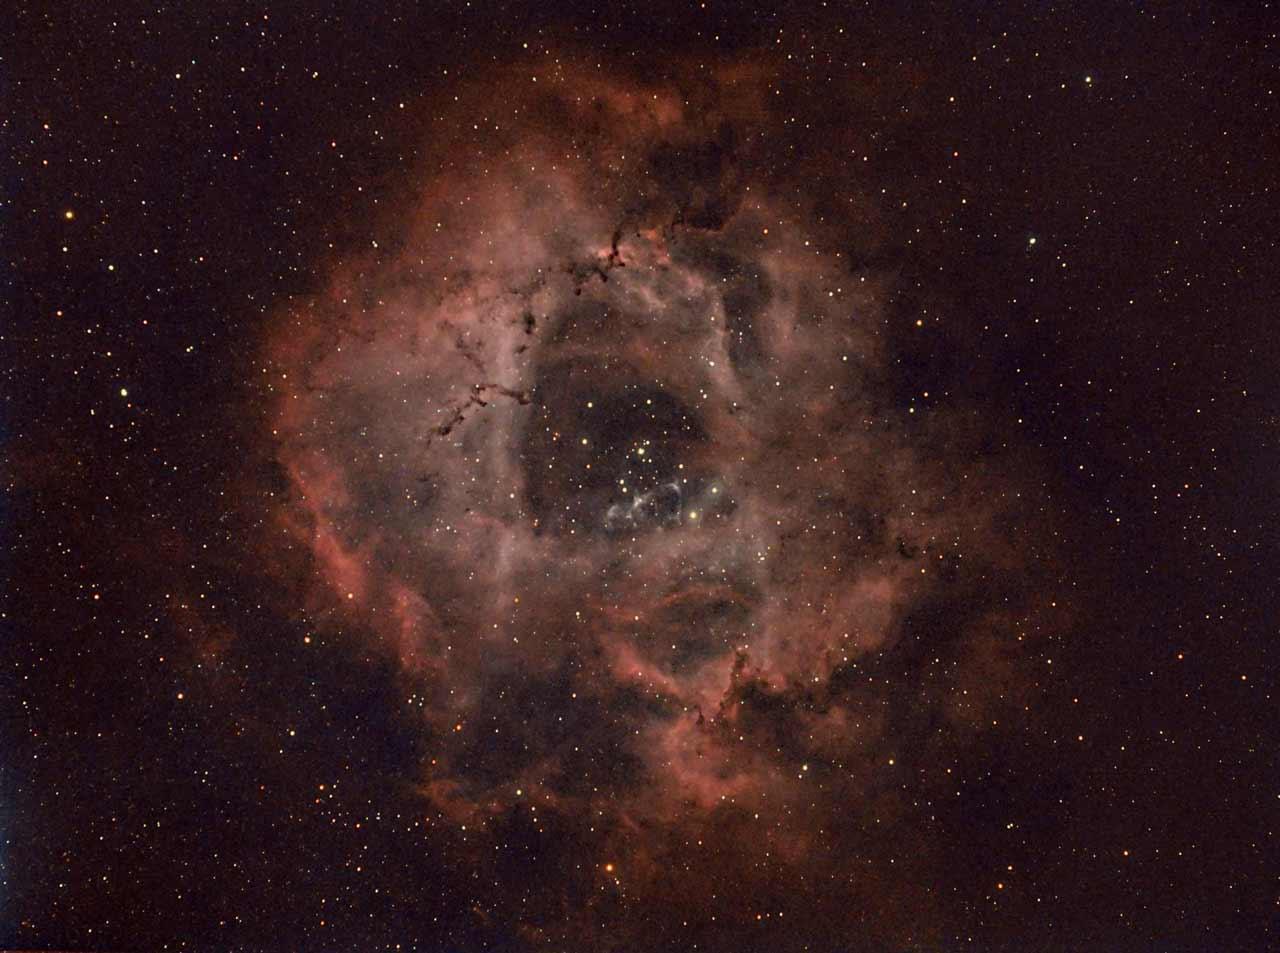 Rosette Nebula, Caldwell 49, SH 2-275 | Author Damyan Ognyanoff - damyan_rm | PHOTO FORUM